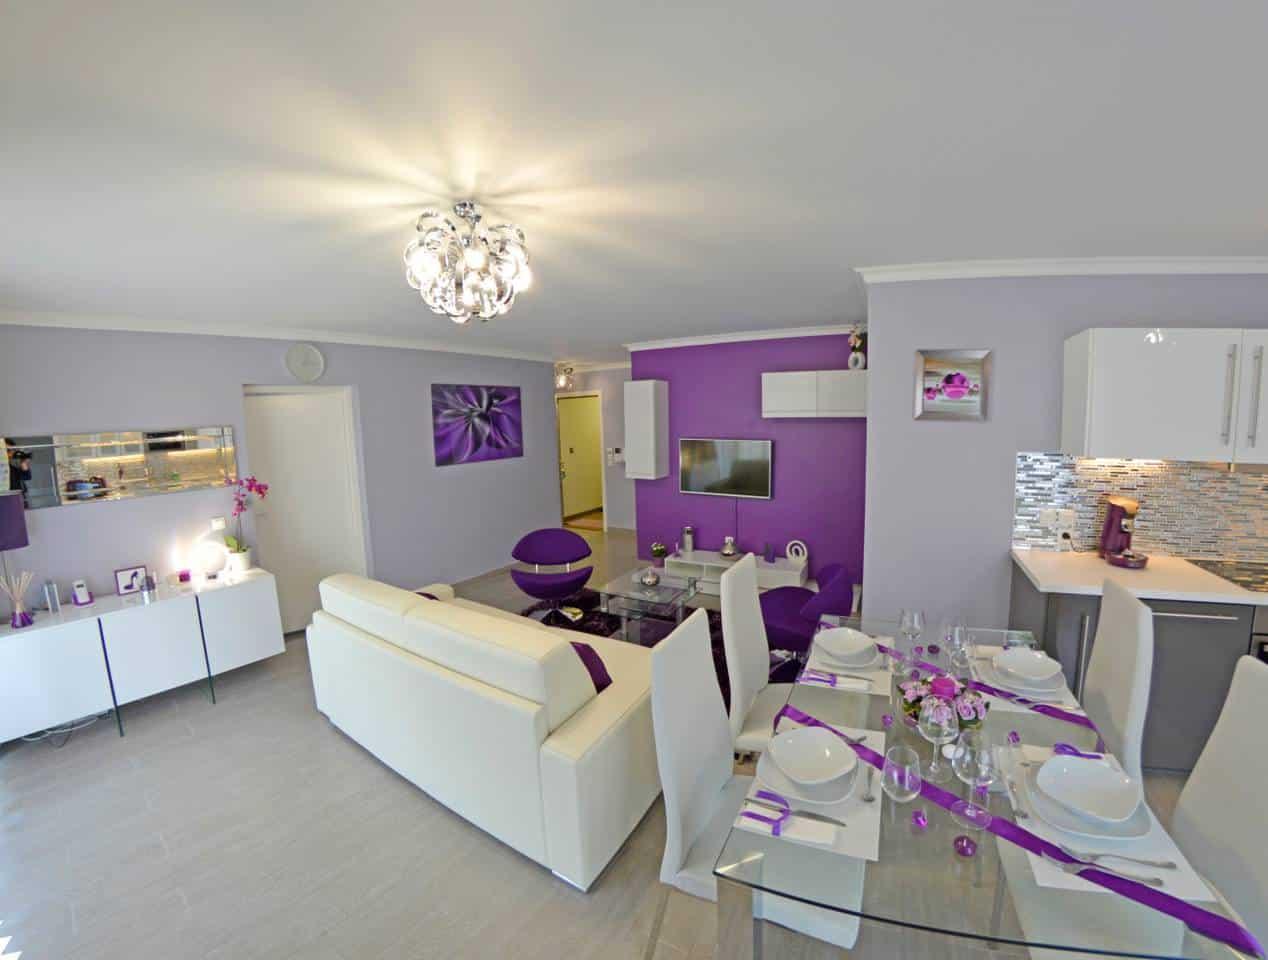 Dreamy! Luxury loft listed on Airbnb Serris. Close to Disneyland Paris!